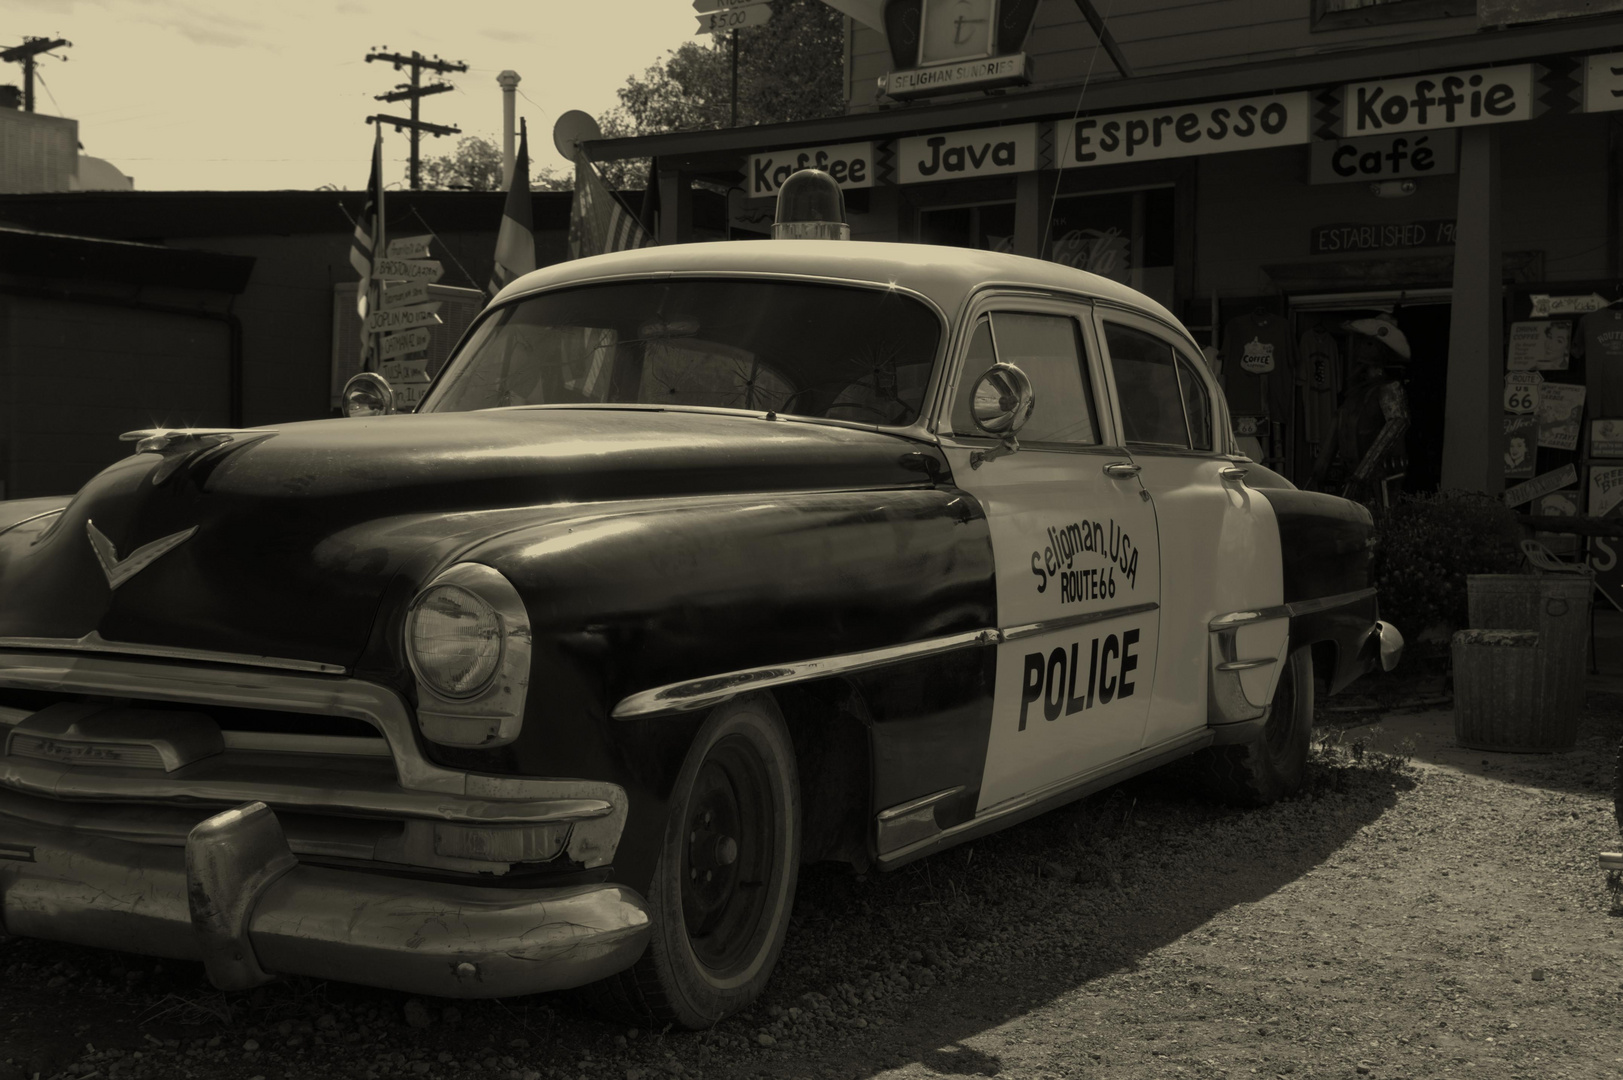 Cars Sheriff - Route 66, Arizona, USA